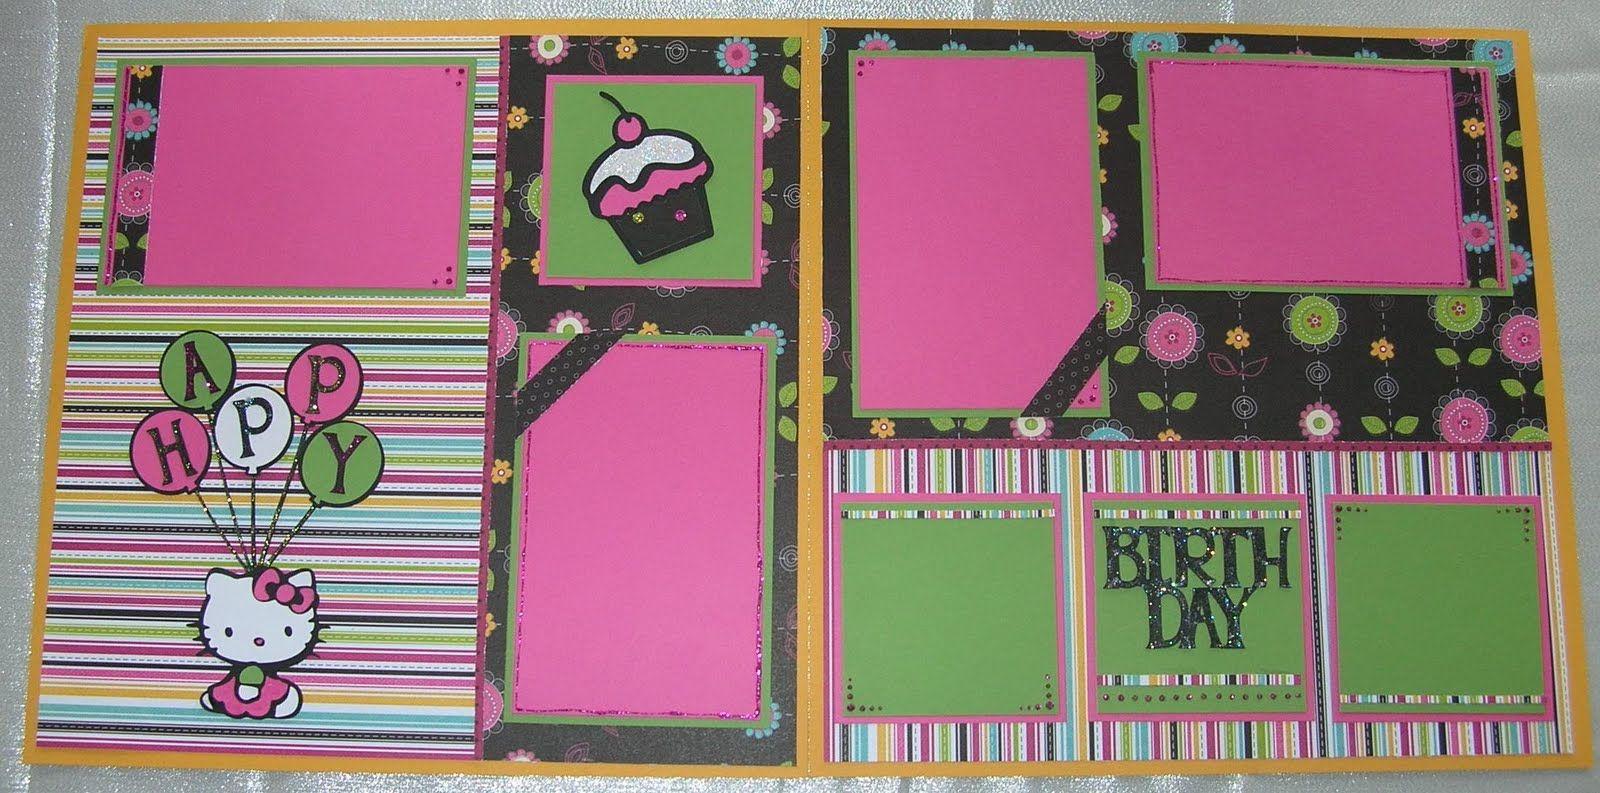 Hello kitty scrapbook ideas - Cricut Ideas Bee S Creative Designs New Hello Kitty Cricut Projects